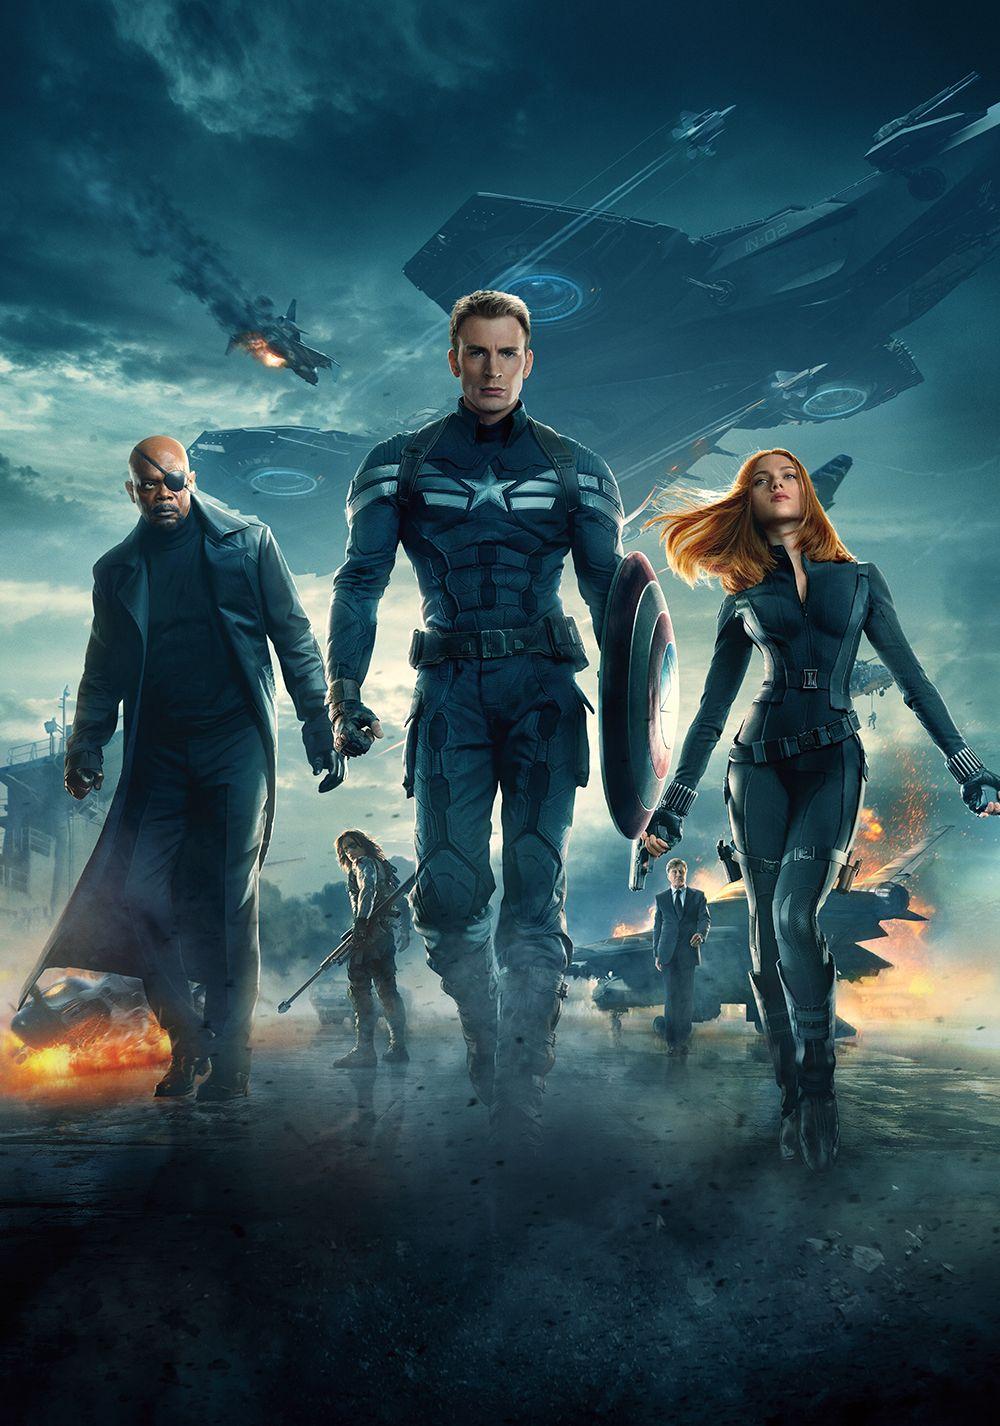 Movie Detail Fanart Tv Fanart Tv Winter Soldier Movie Marvel Movie Posters Captain America Winter